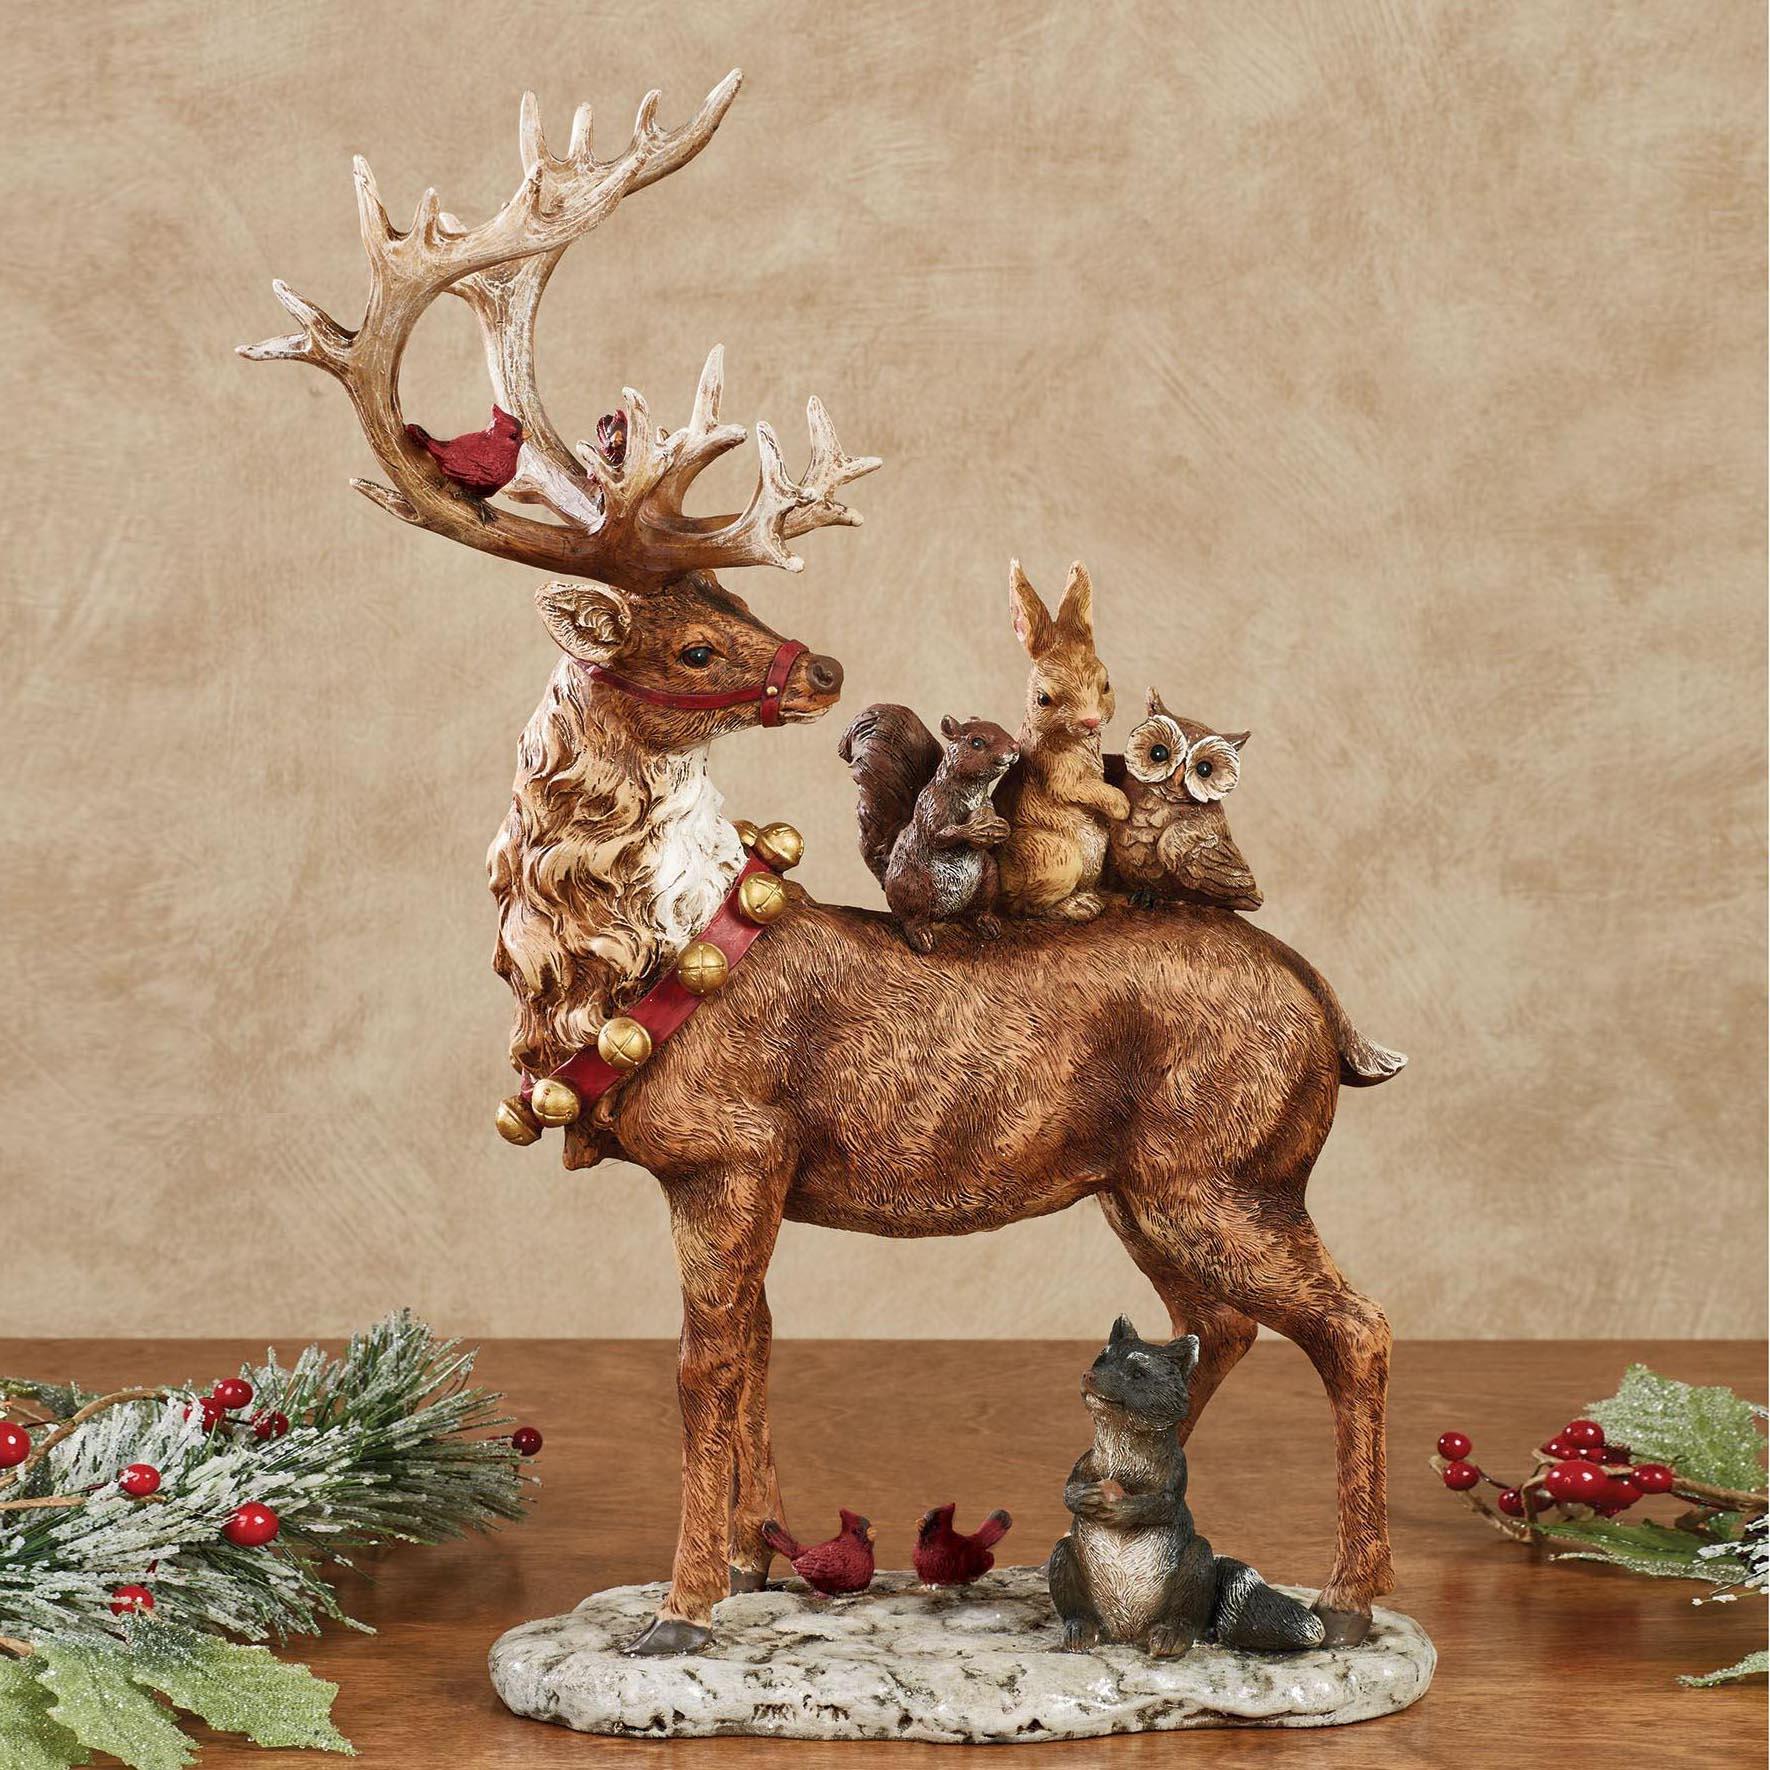 reindeer sculpture for Christmas decorations